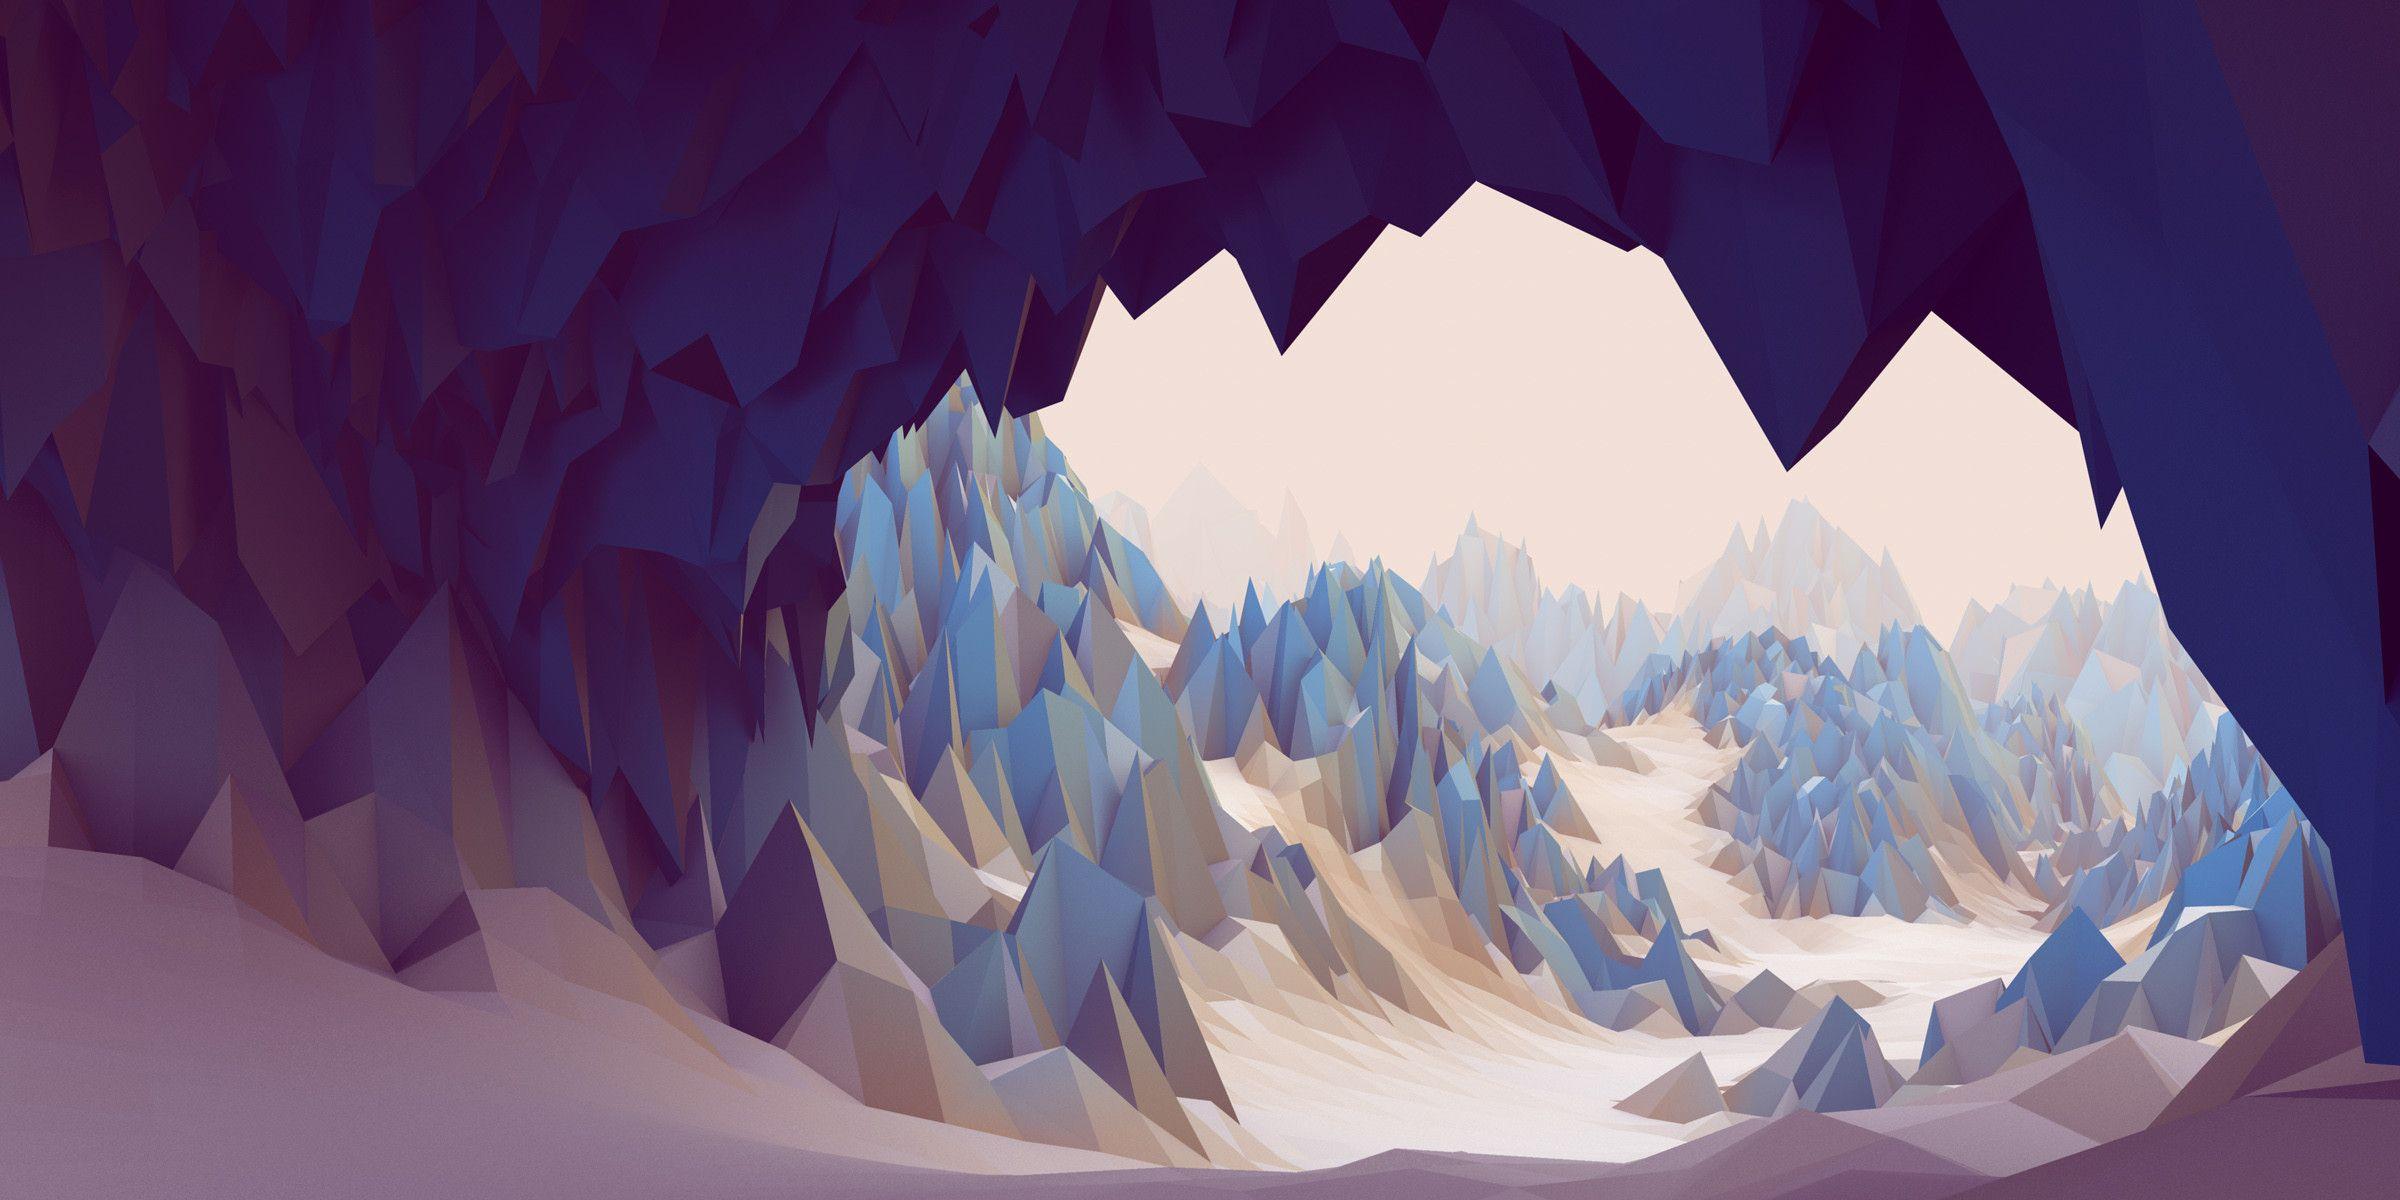 Low Polygon Cave Wallpaper 2400x1200 Id 50780 Polygon Art Low Poly Landscape Wallpaper